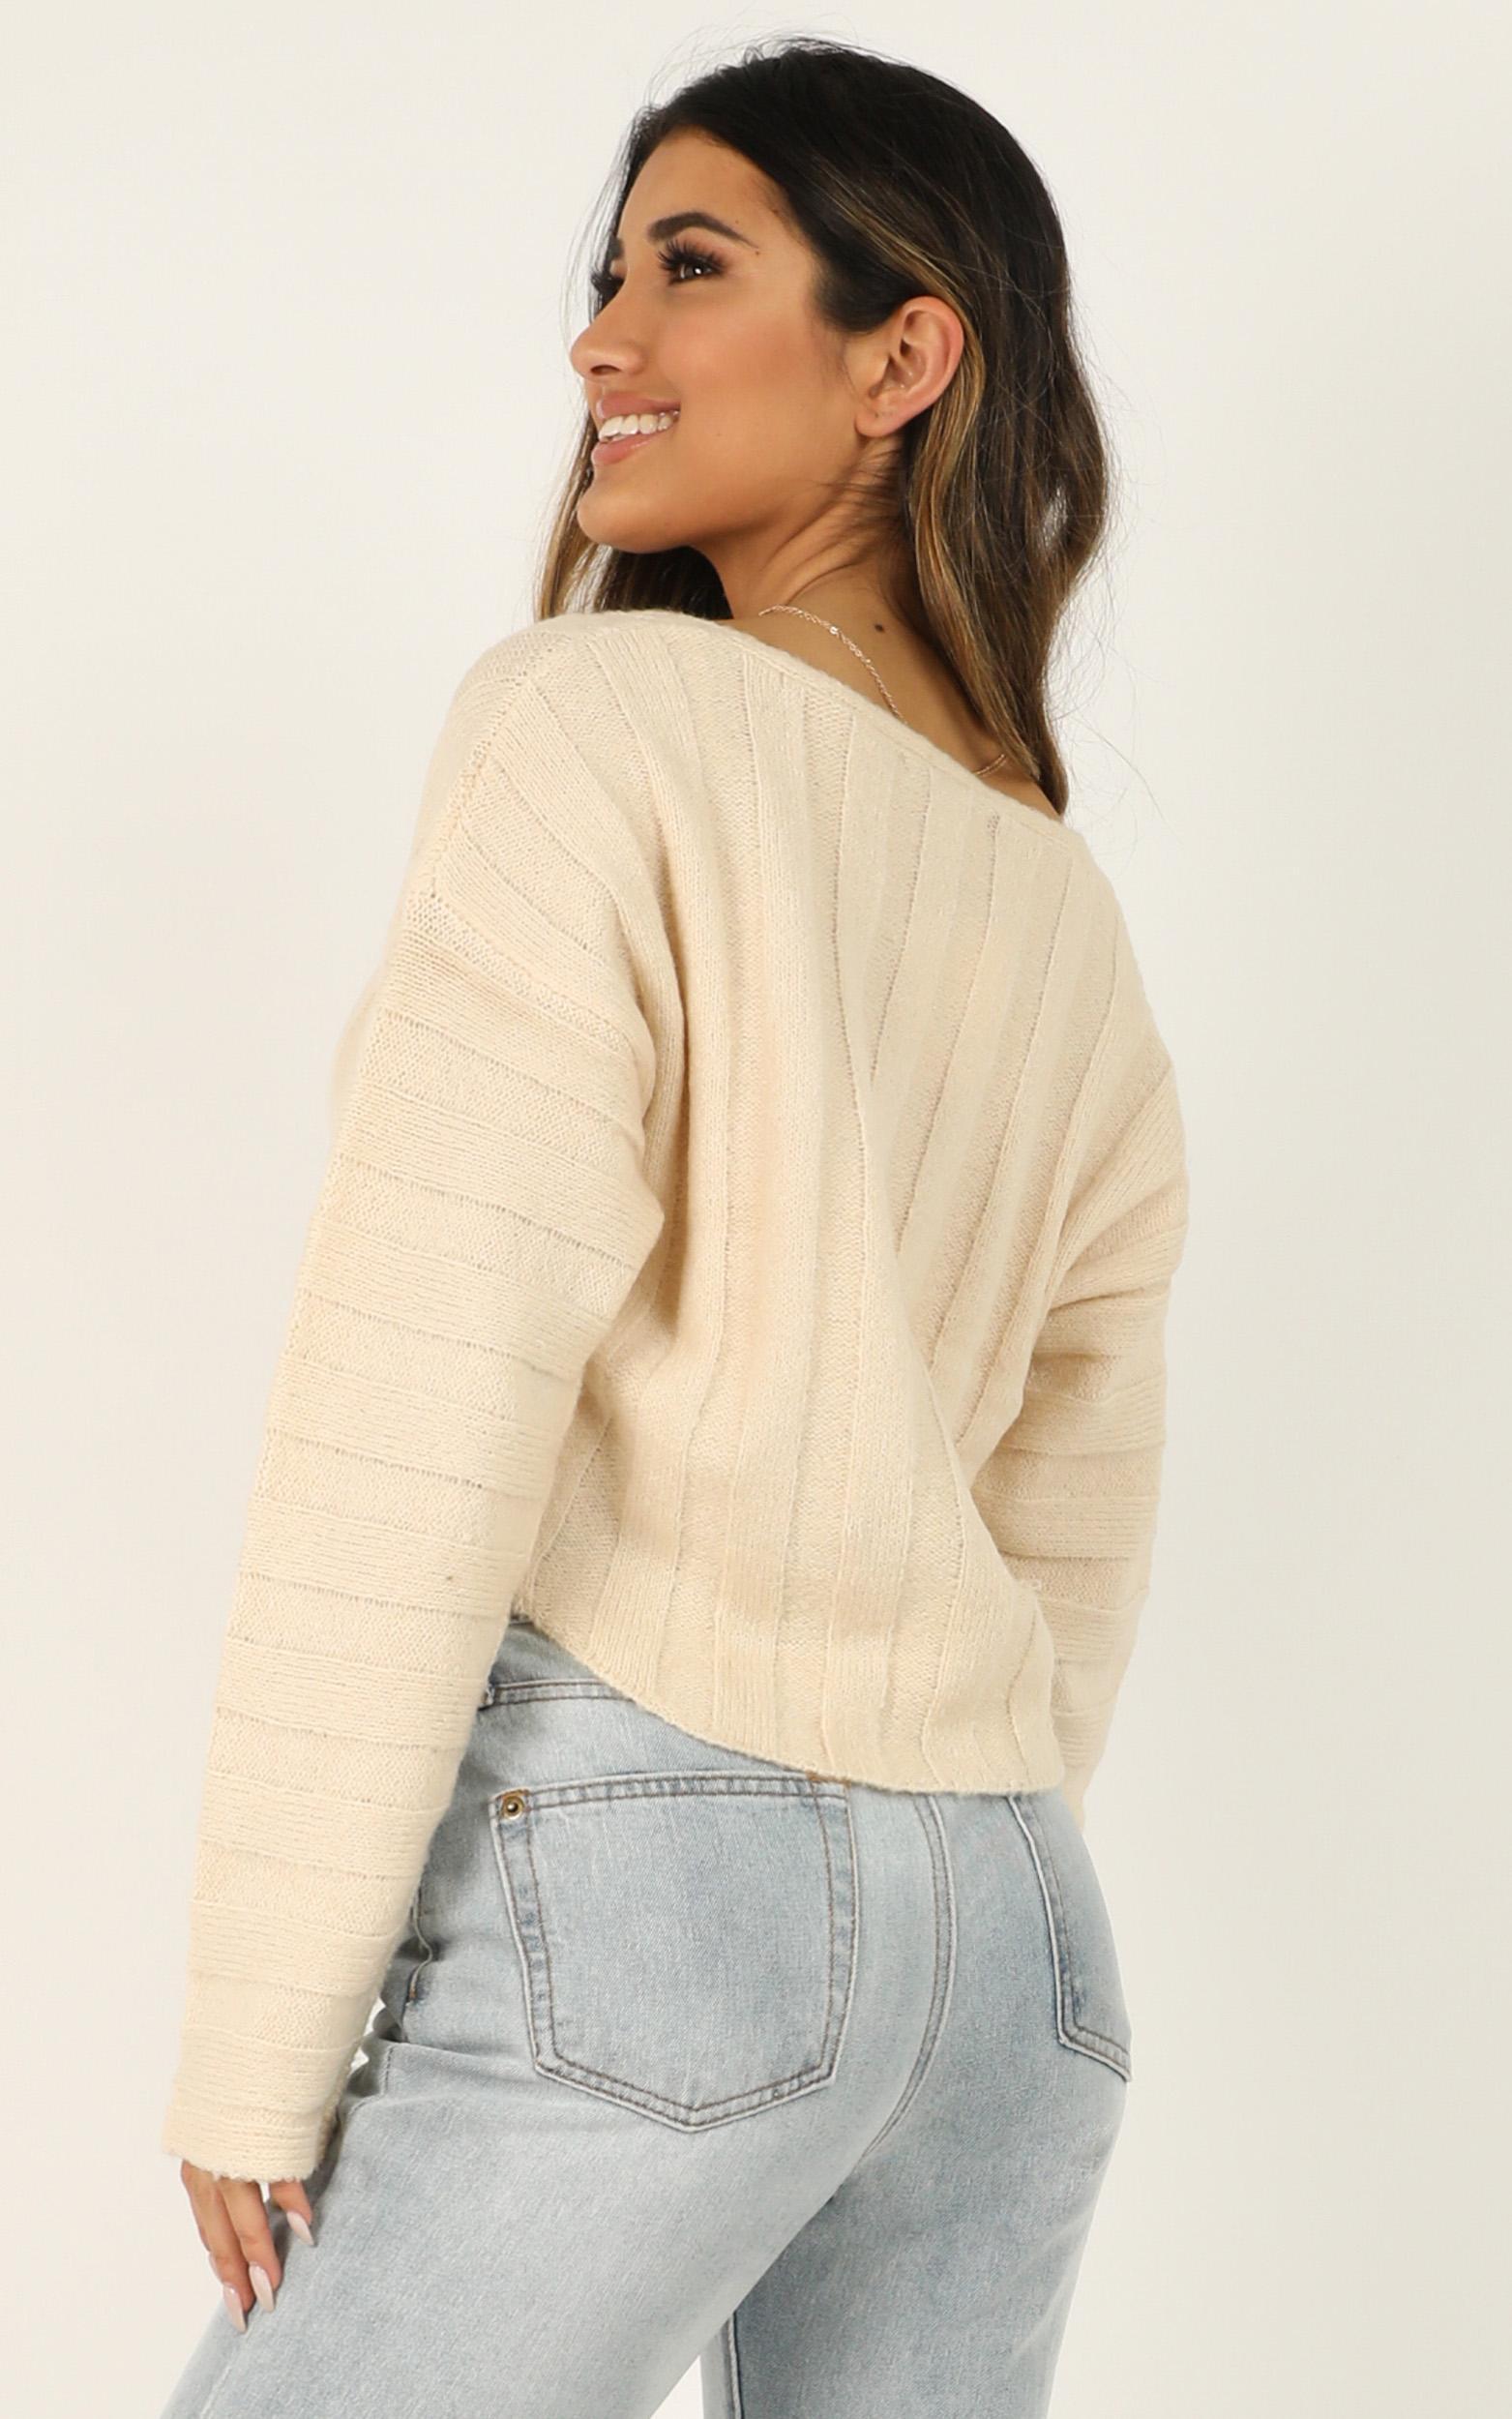 Exact Details knit jumper in cream - 12 (L), Cream, hi-res image number null